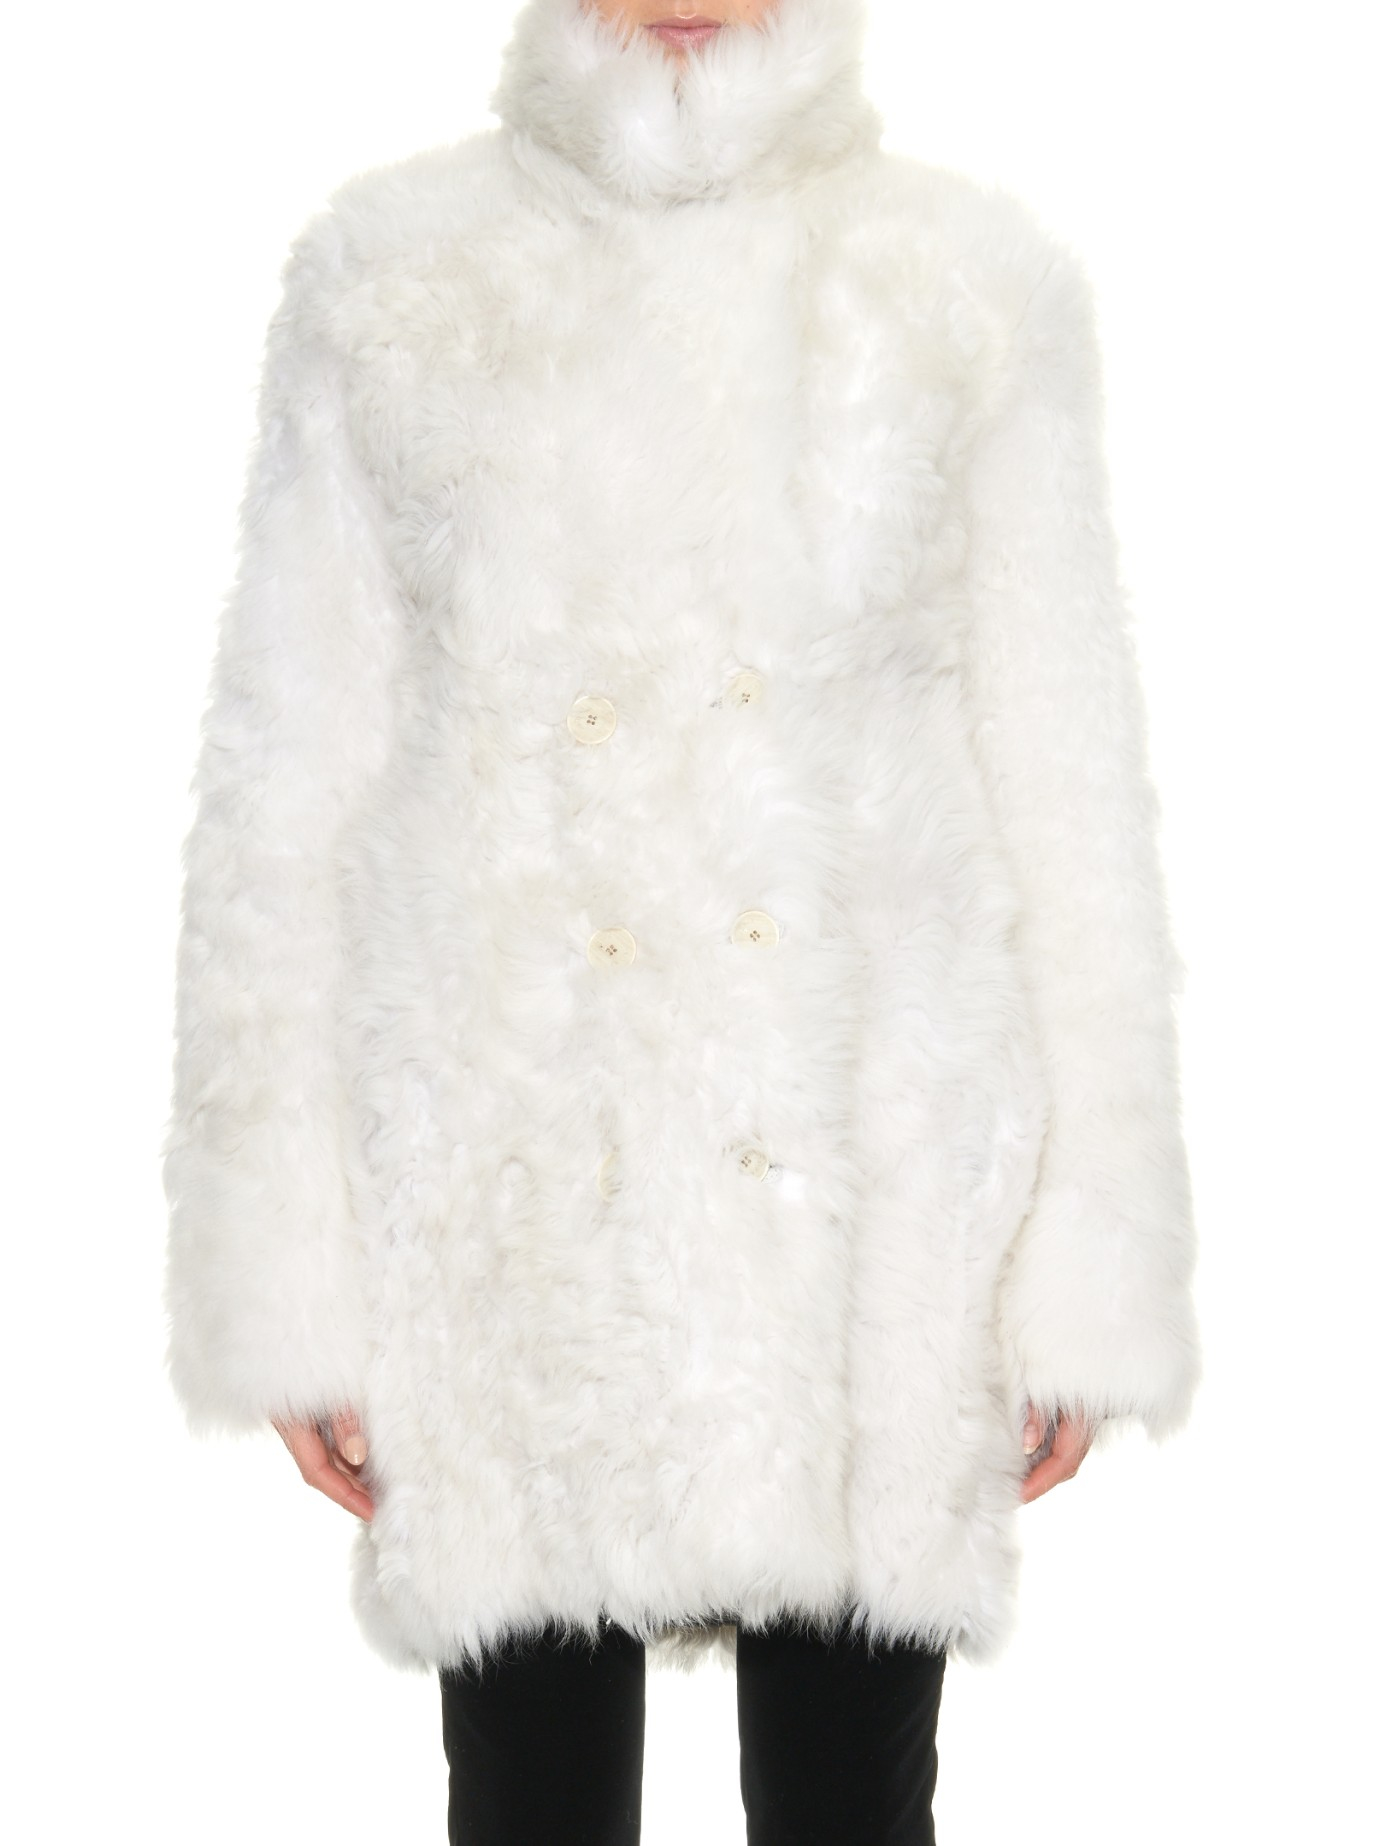 Sonia rykiel Toscana Shearling Coat in White | Lyst